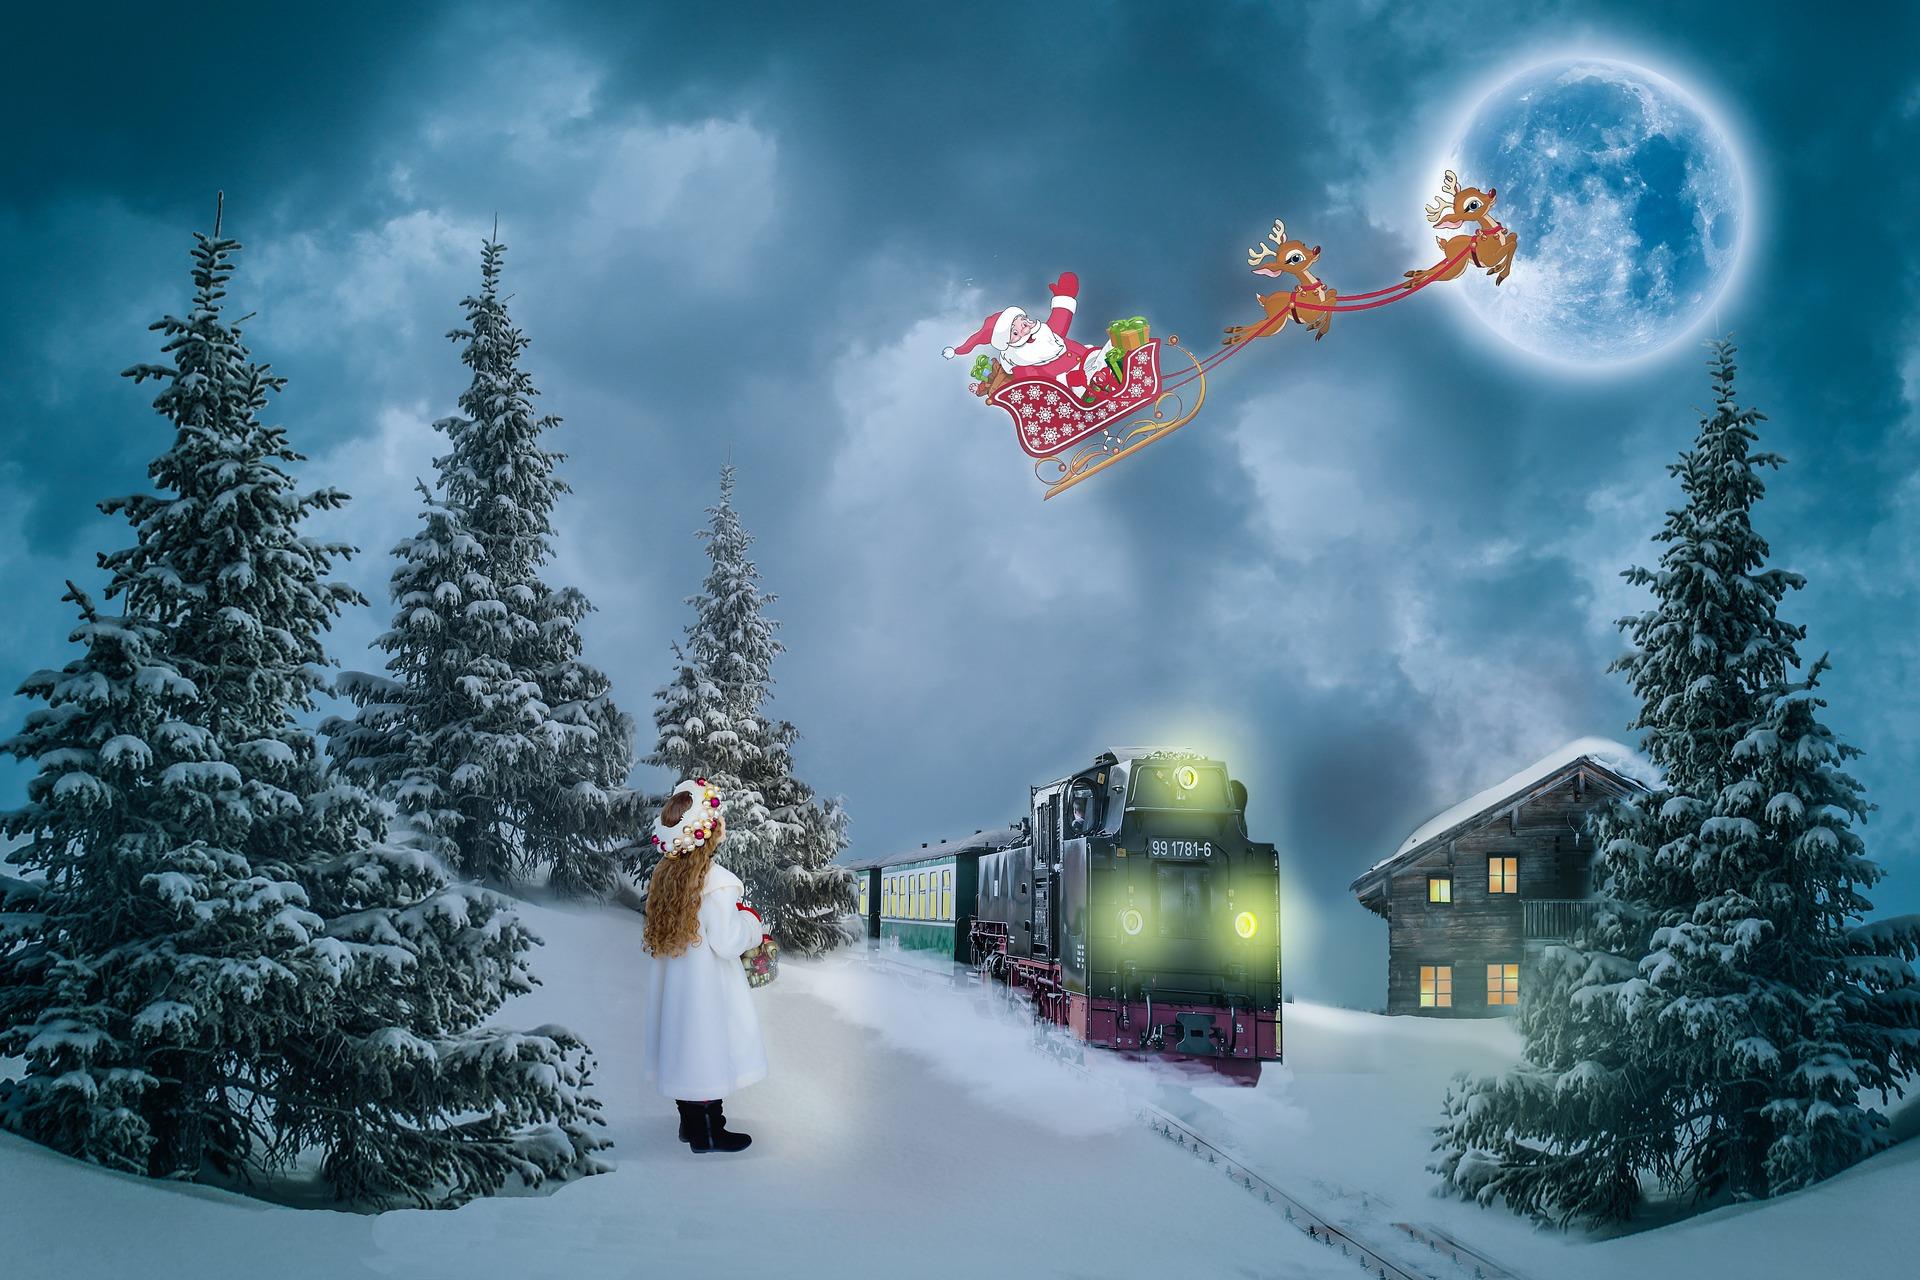 Christmas Wallpaper 800x384: Christmas Wallpaper HD Wallpaper